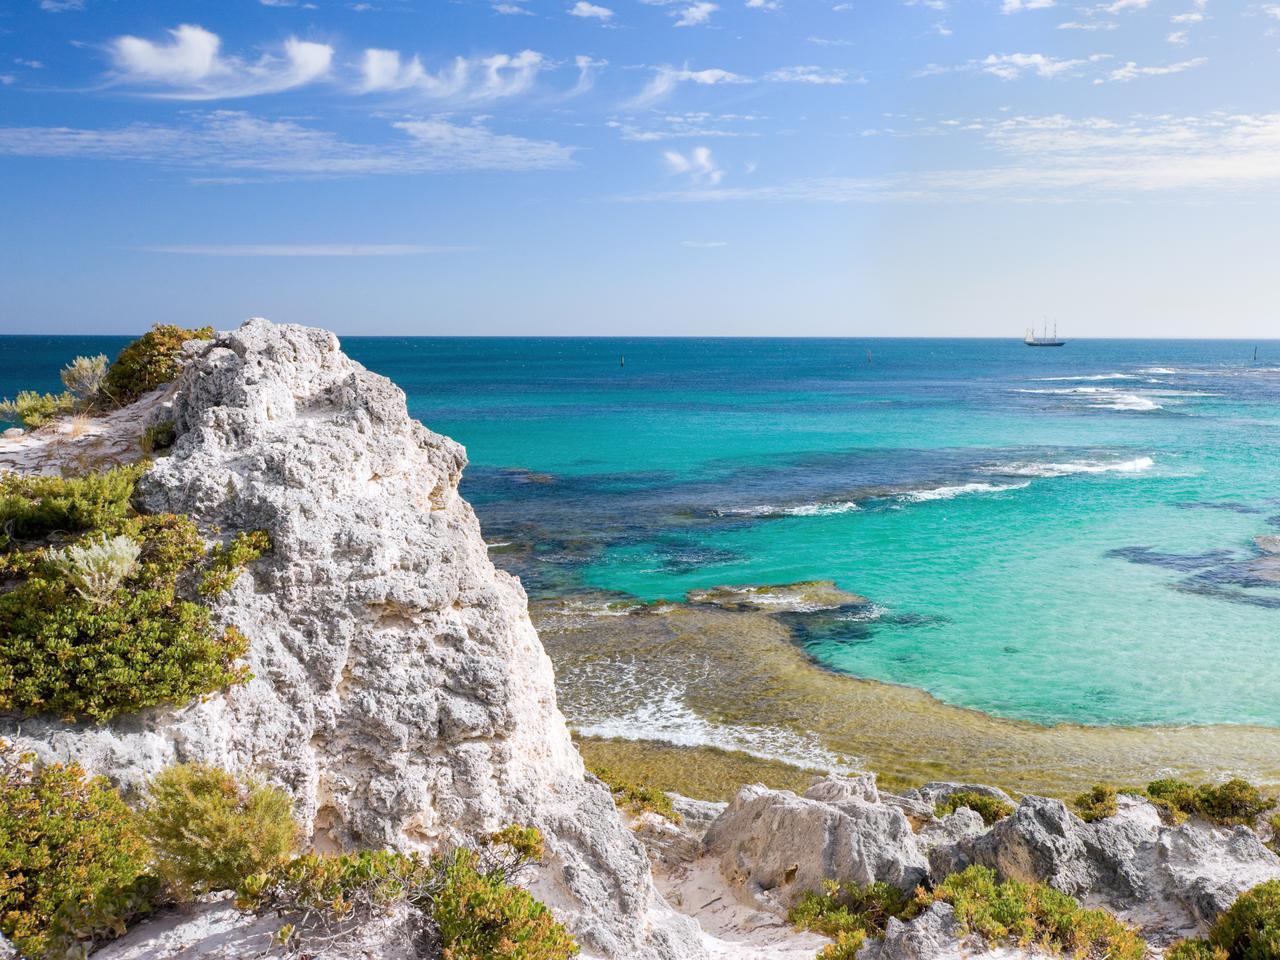 Scenic view over the shore of Rottnest island in australia